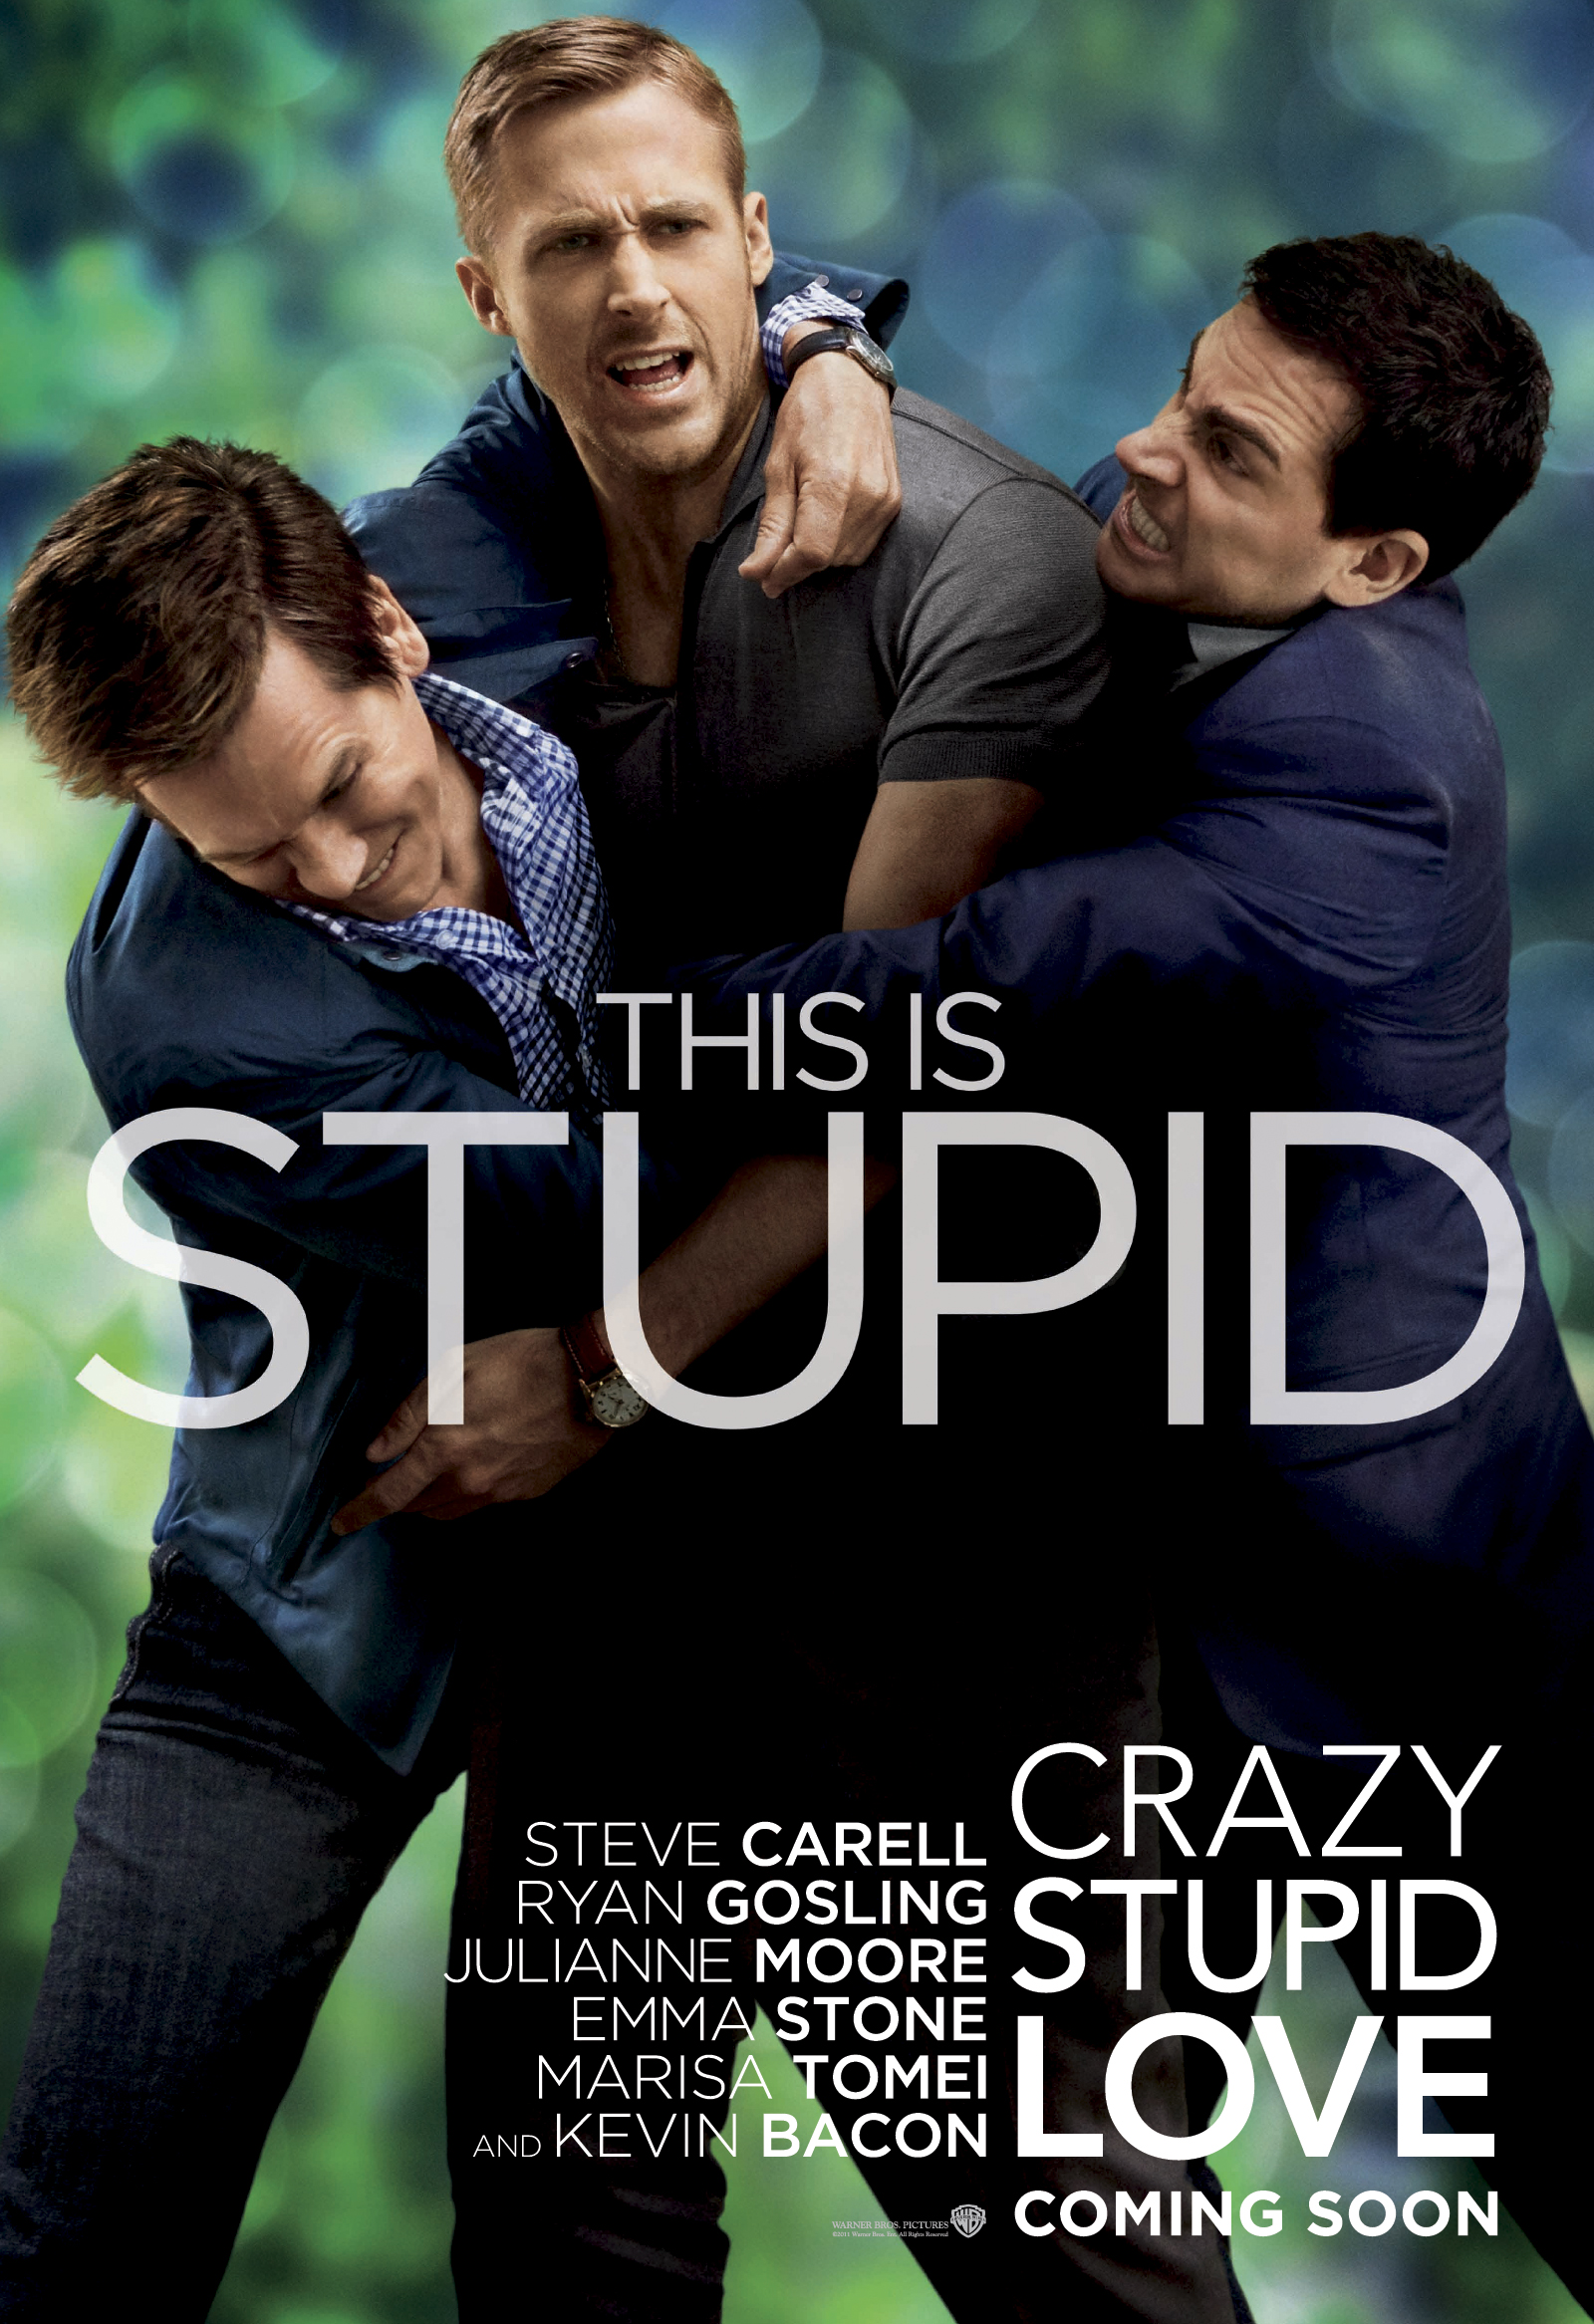 Crazy, Stupid, Love Movie Poster